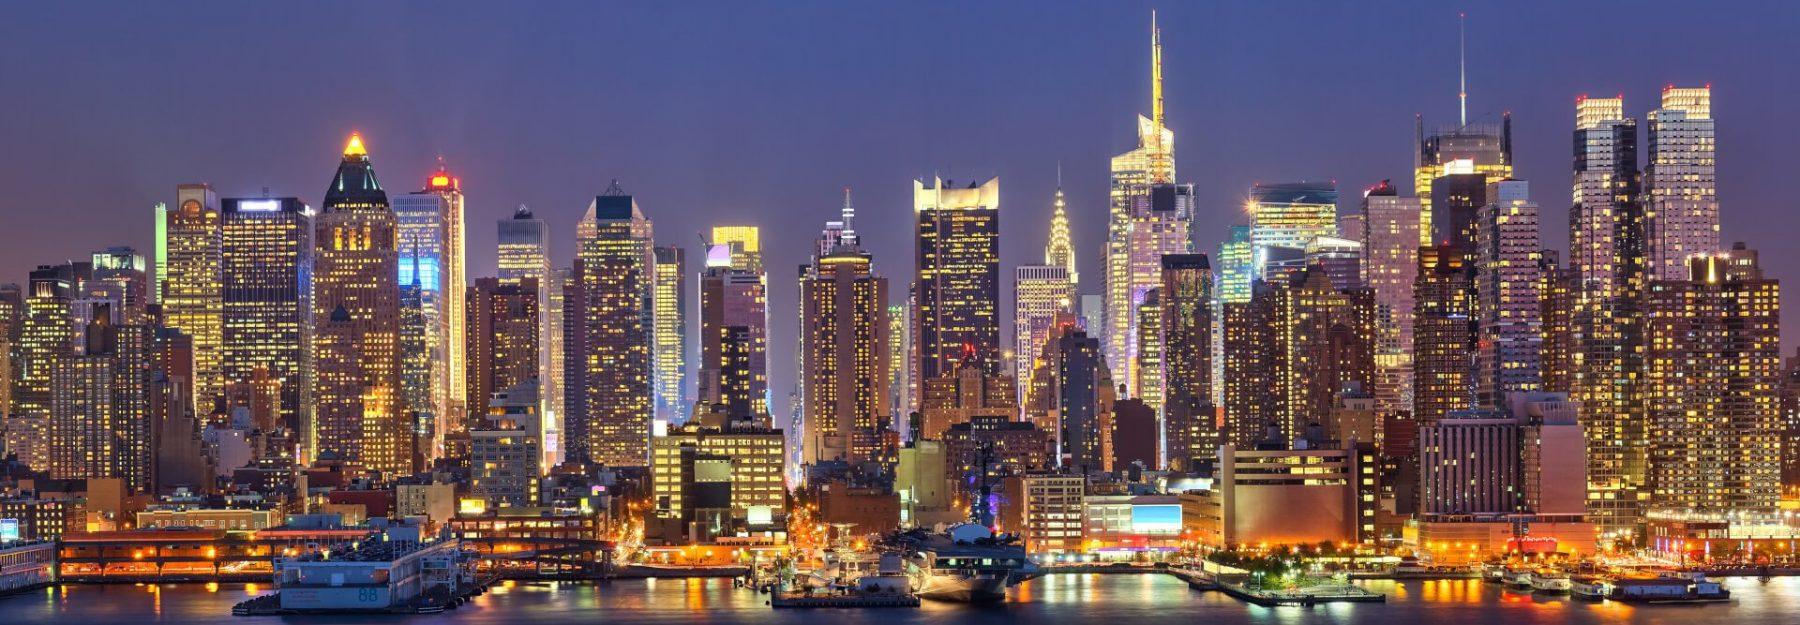 Viaggio a New York Manhattan